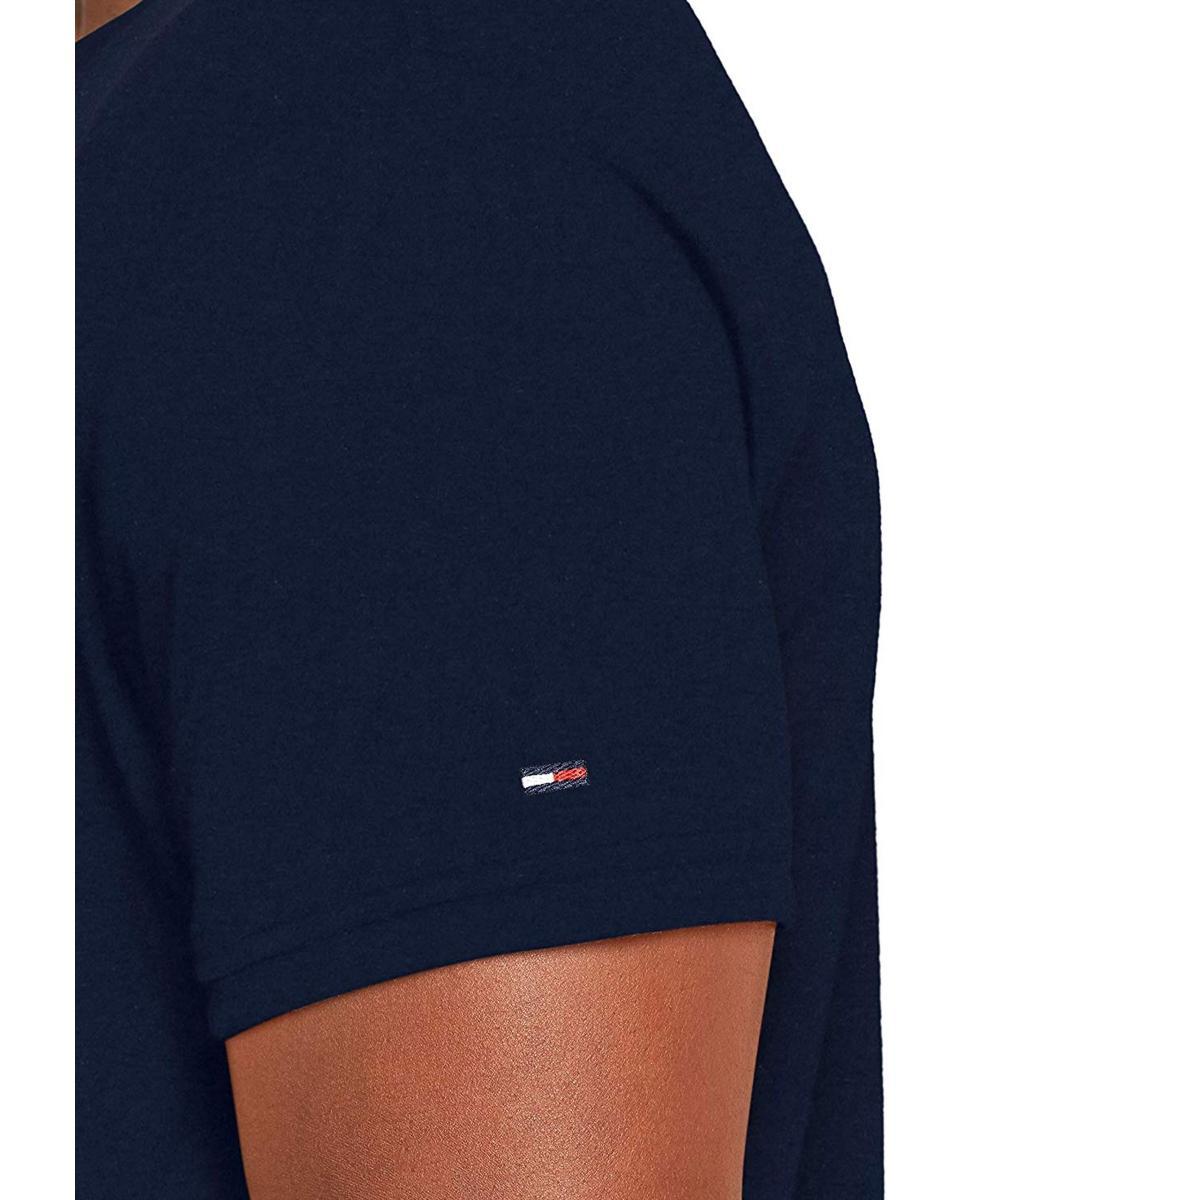 T-shirt Tommy Jeans in cotone biologico da uomo rif. DM0DM04528